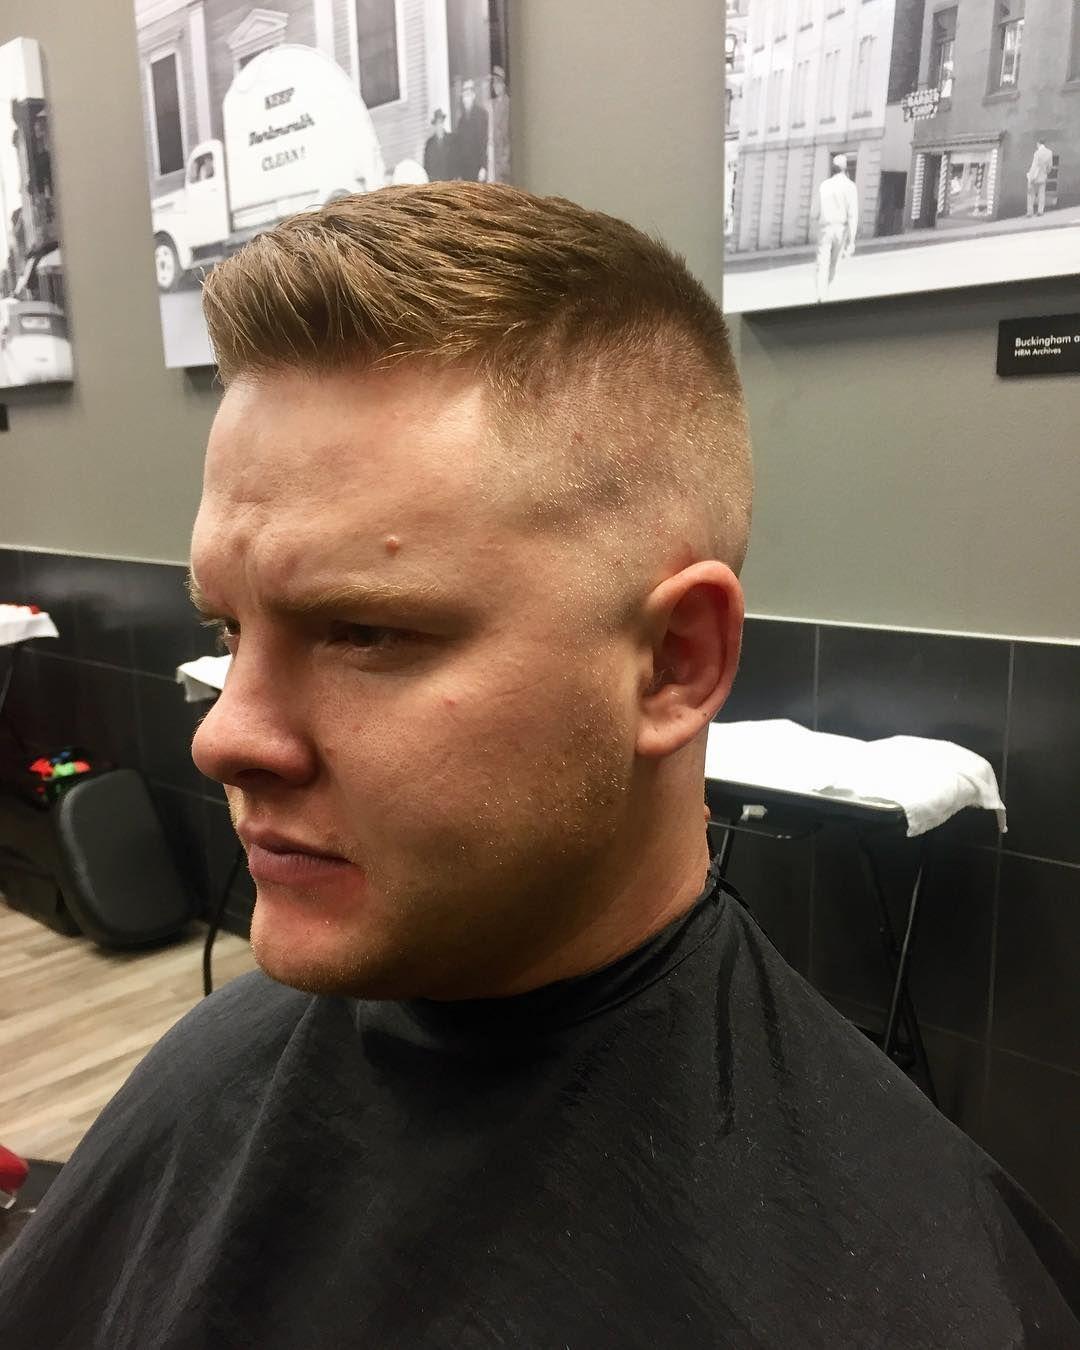 Military Haircuts In 2018 Boy Haircuts Pinterest Ivy League